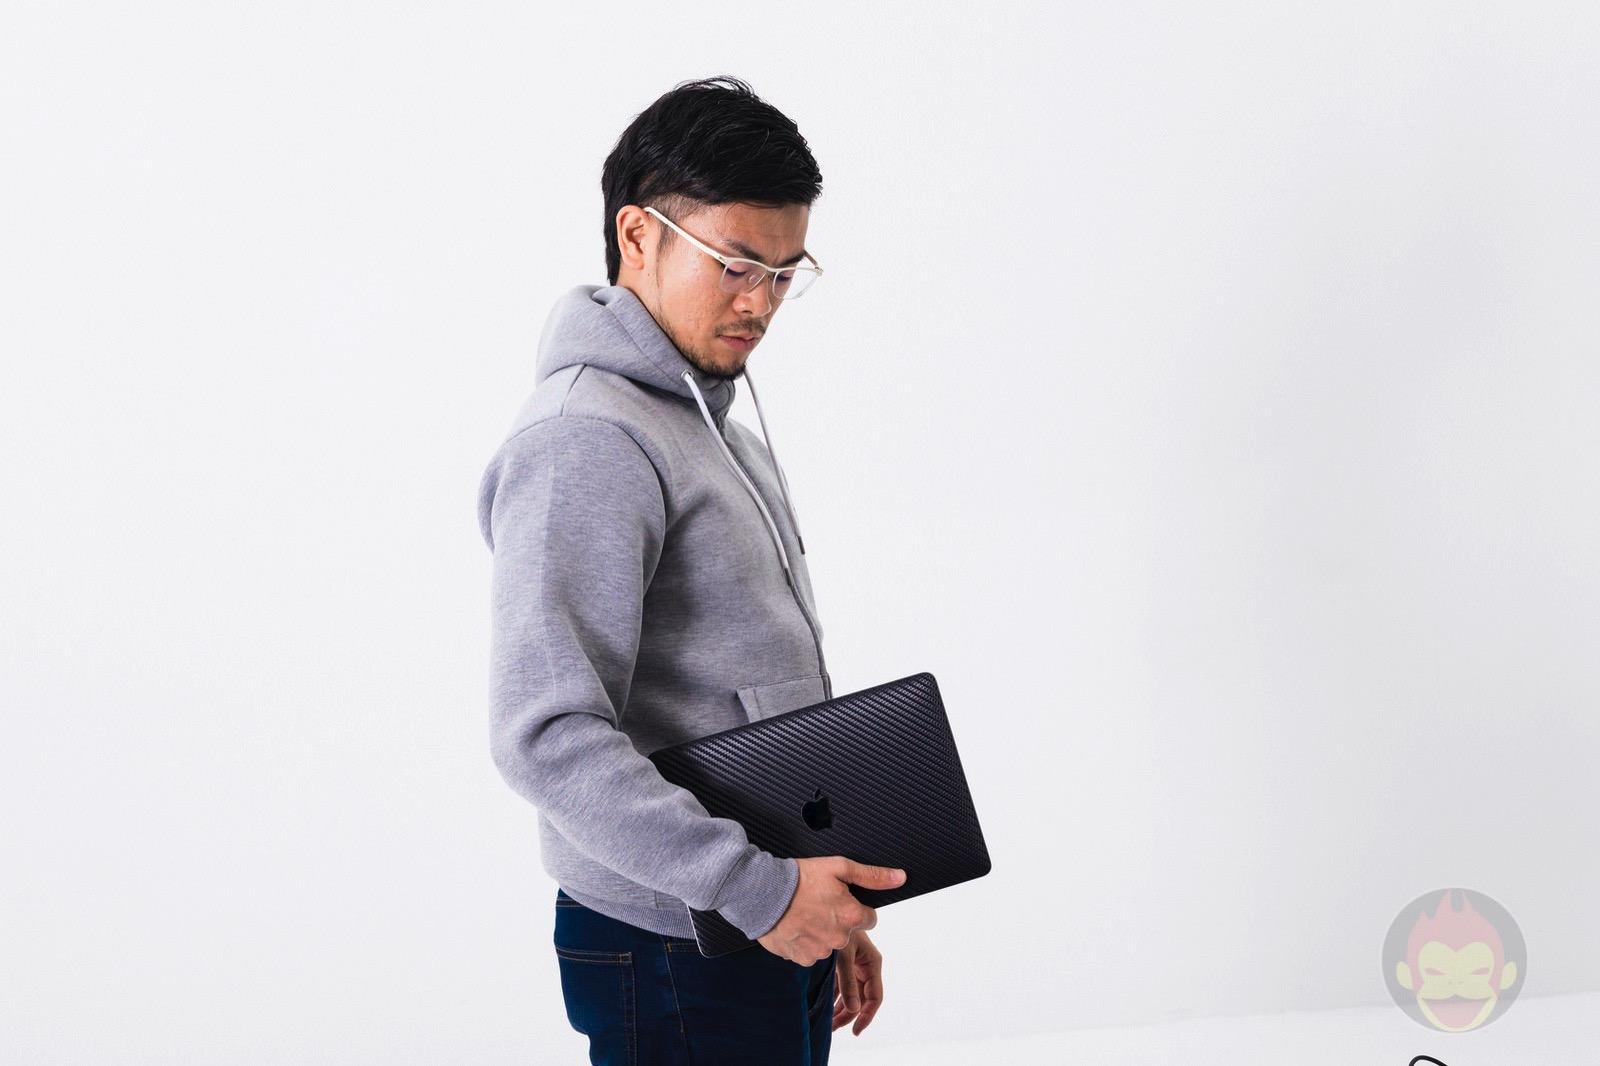 Holding-my-MacBook-Pro-2018-01.jpg